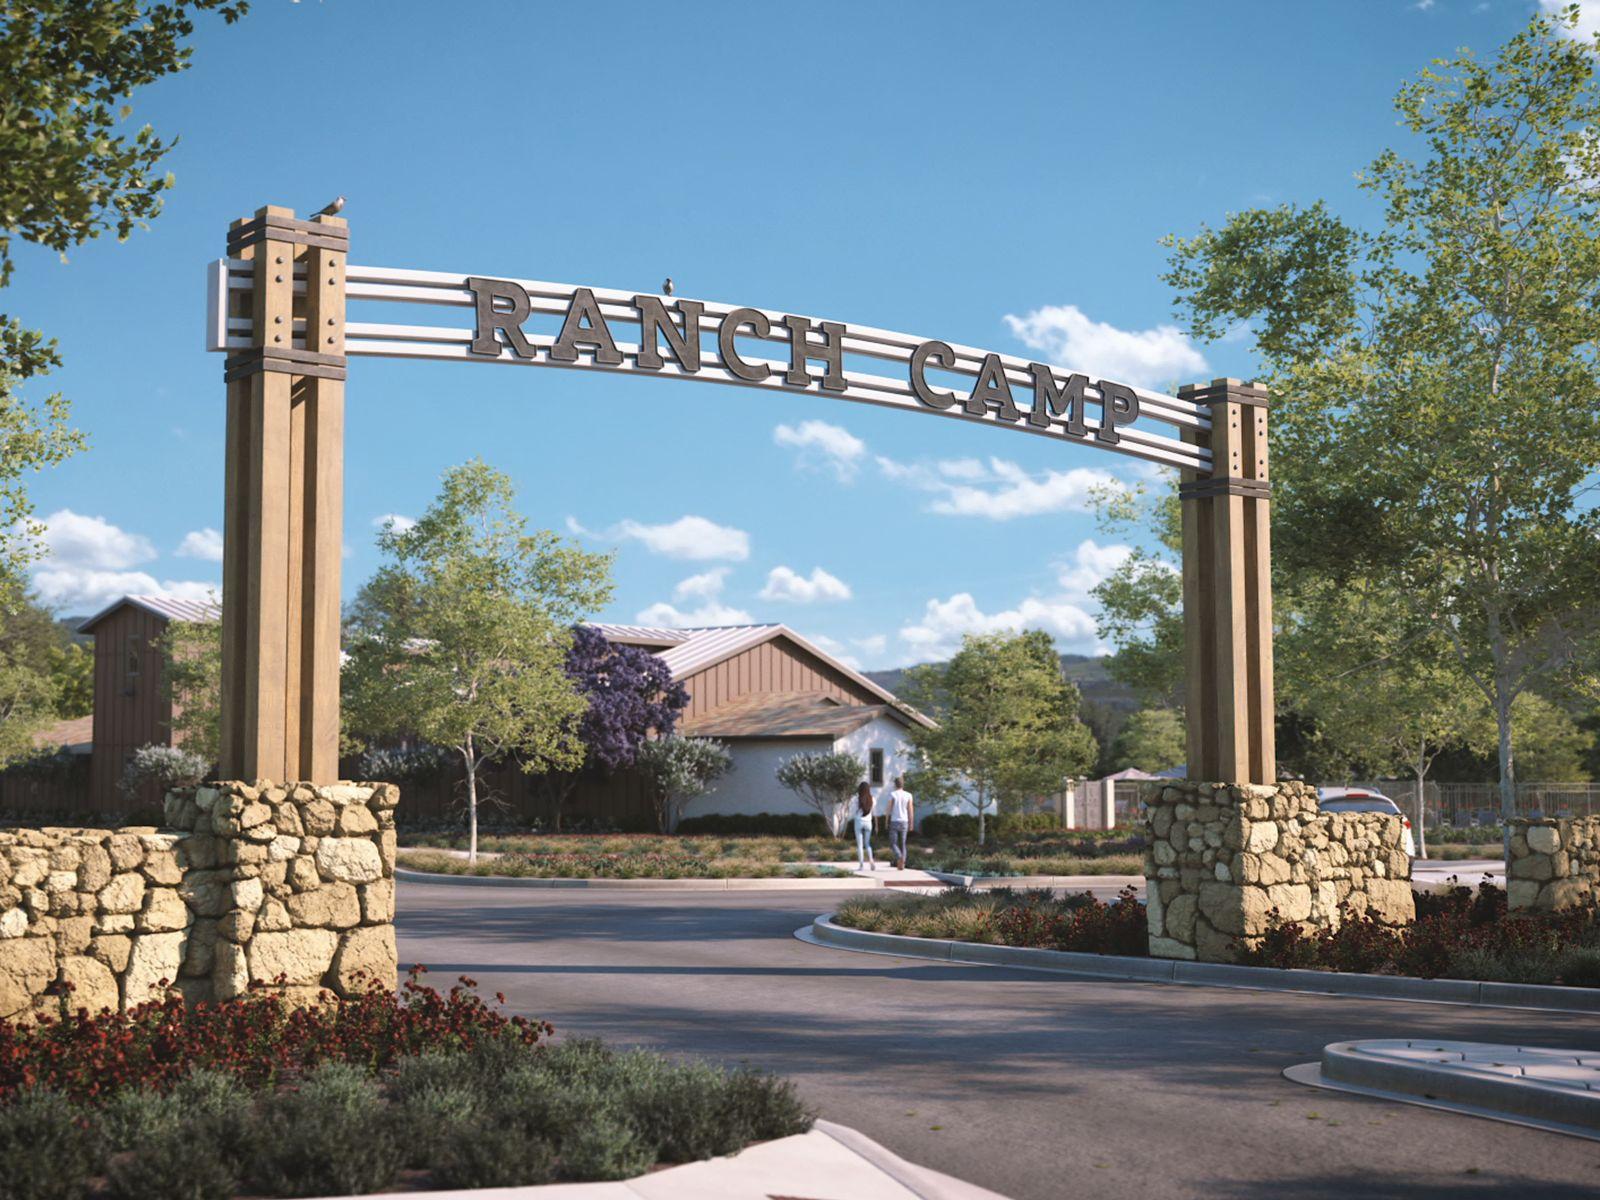 The Ranch Camp at Rancho Mission Viejo